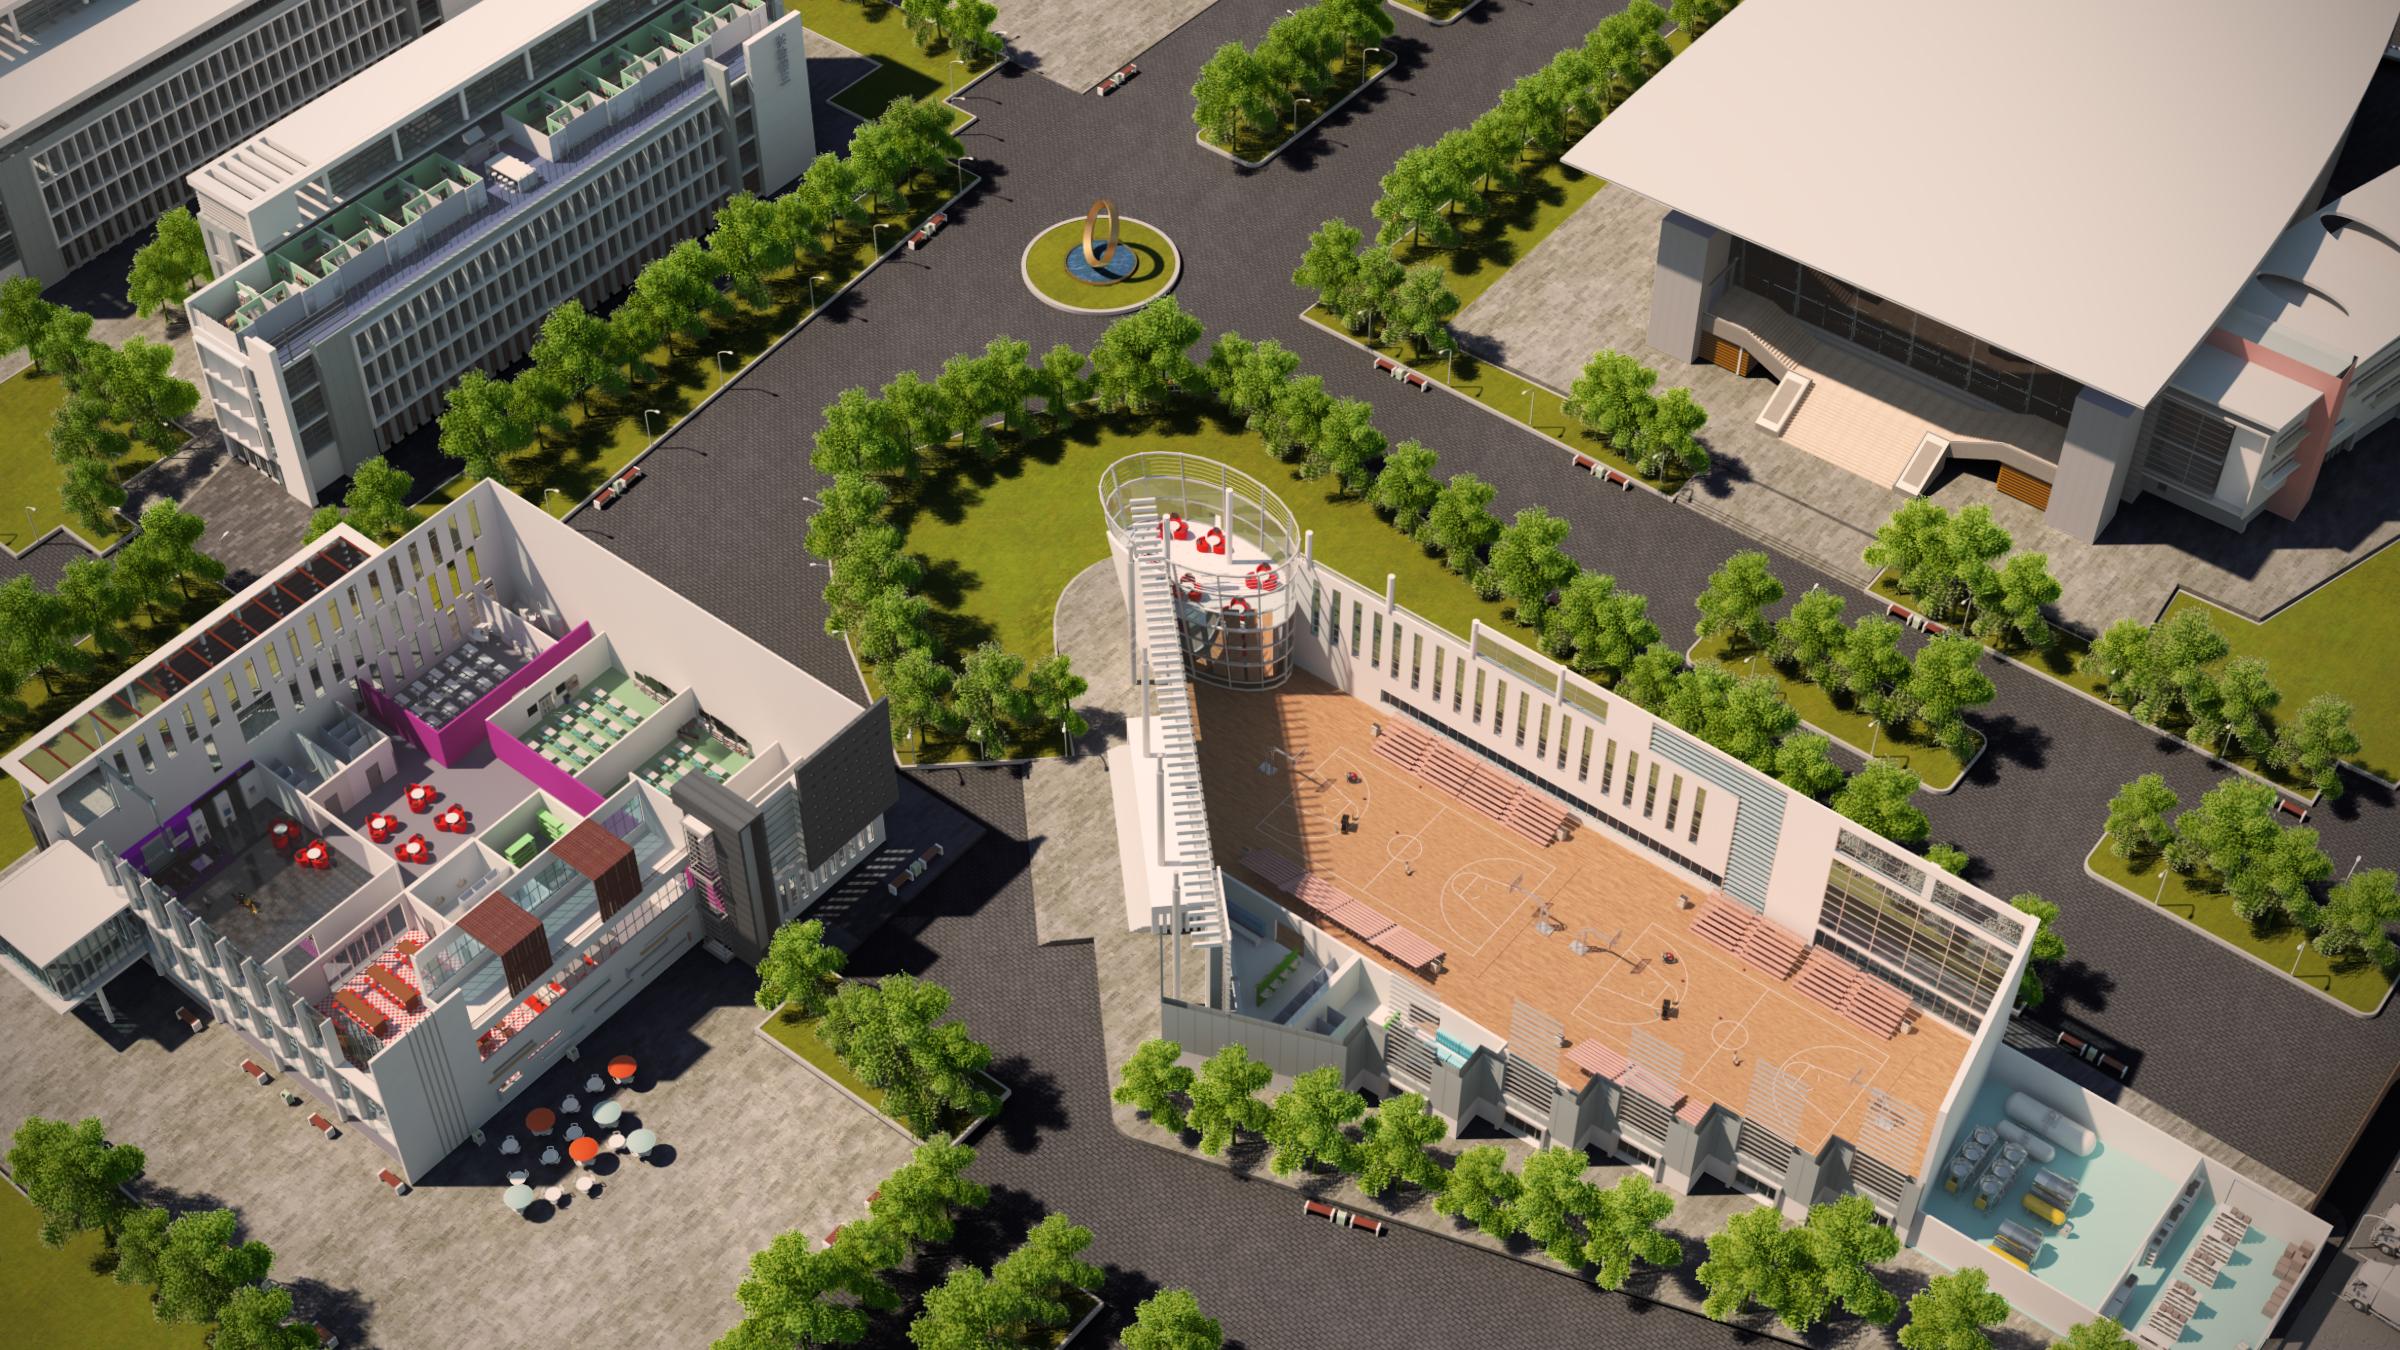 University Campus 3D Aerial View